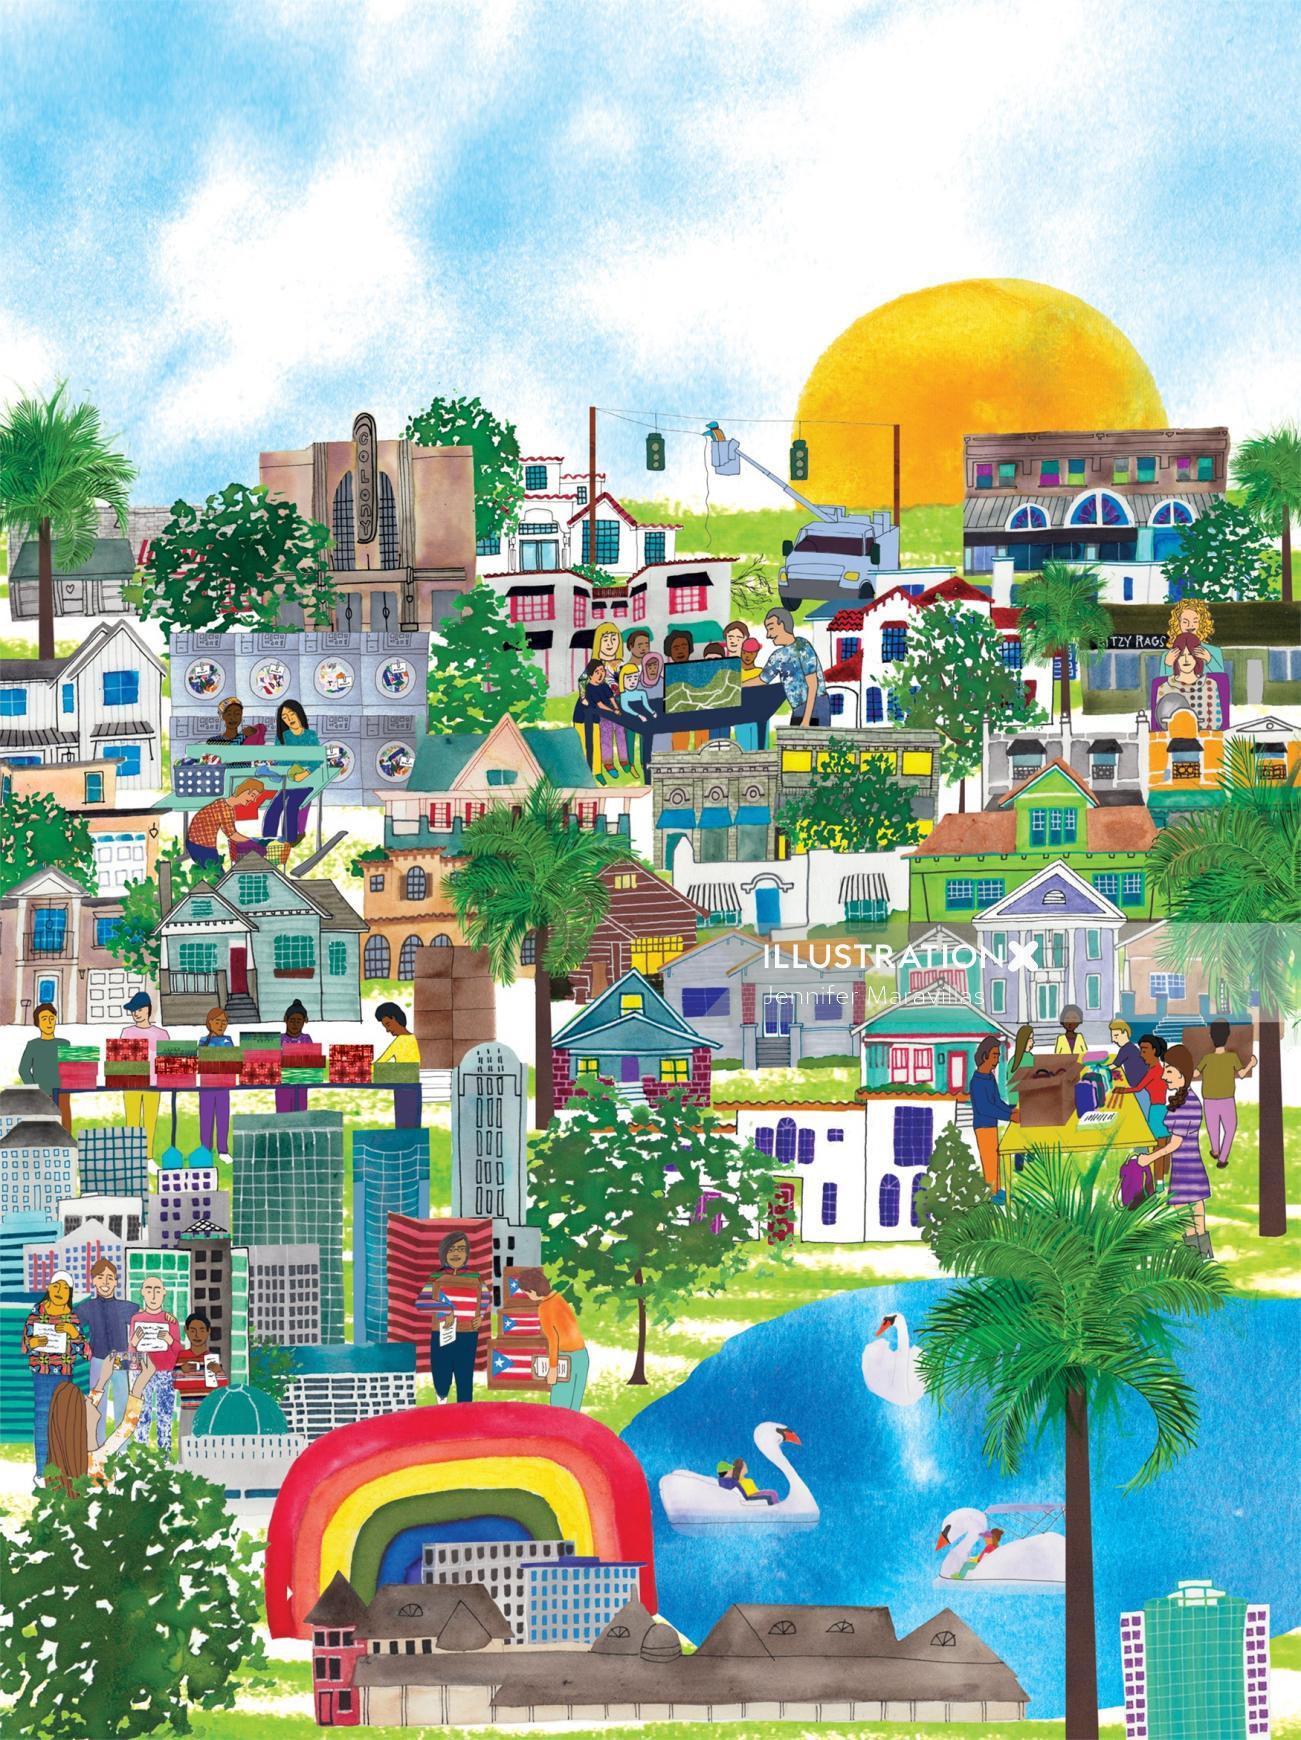 Watercolour Drawing of Orlando Cityscape